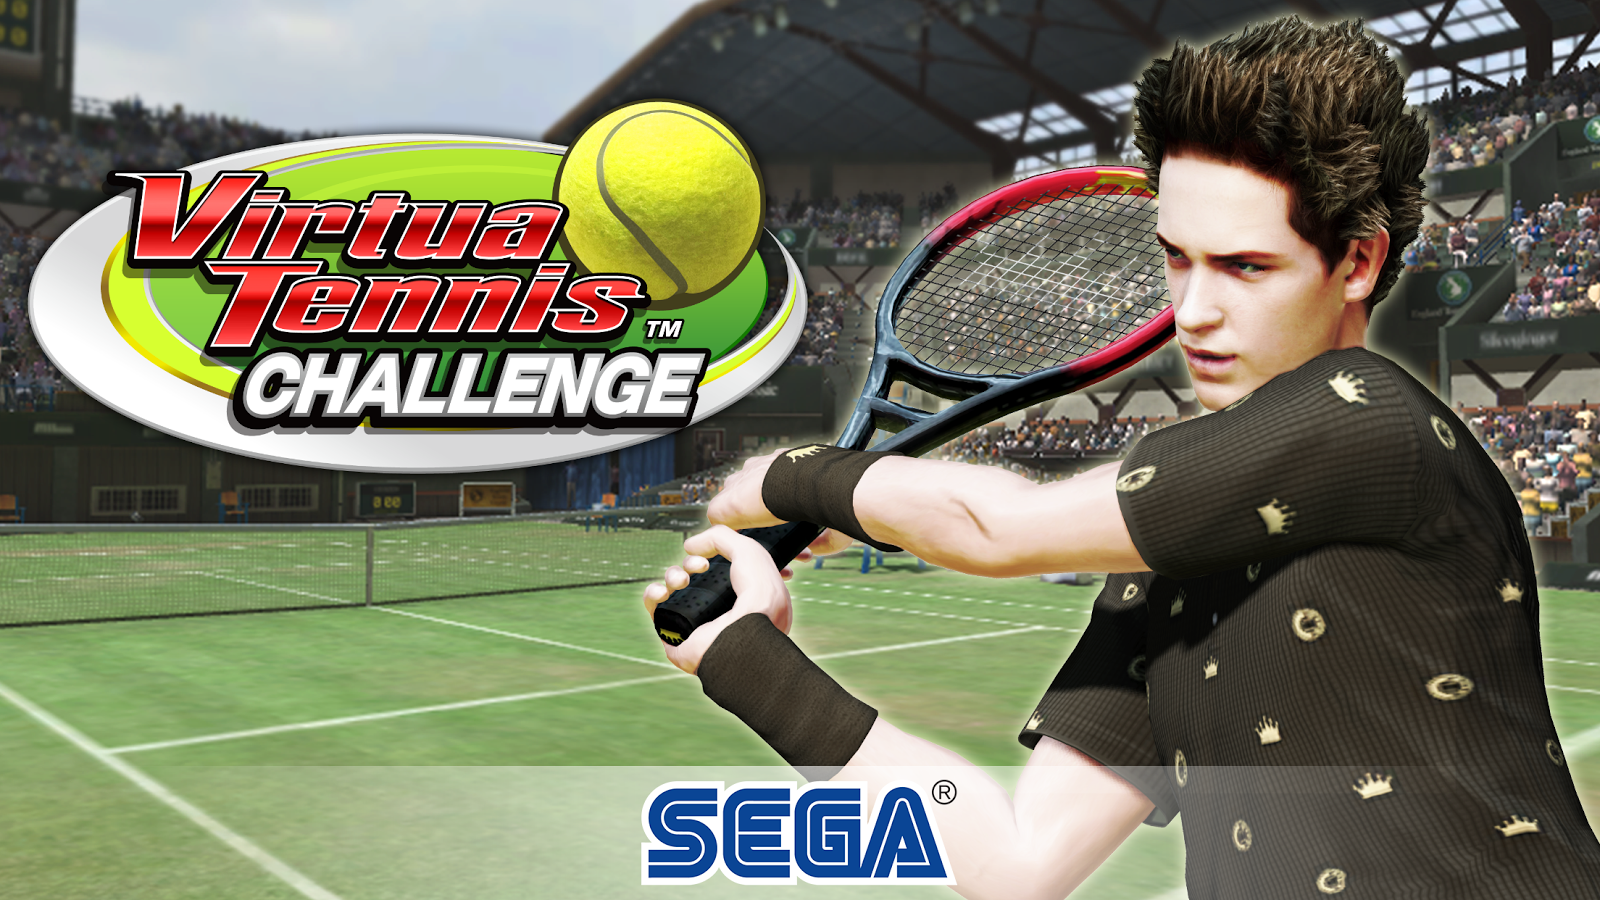 Virtua Tennis Challenge MOD APK Terbaru